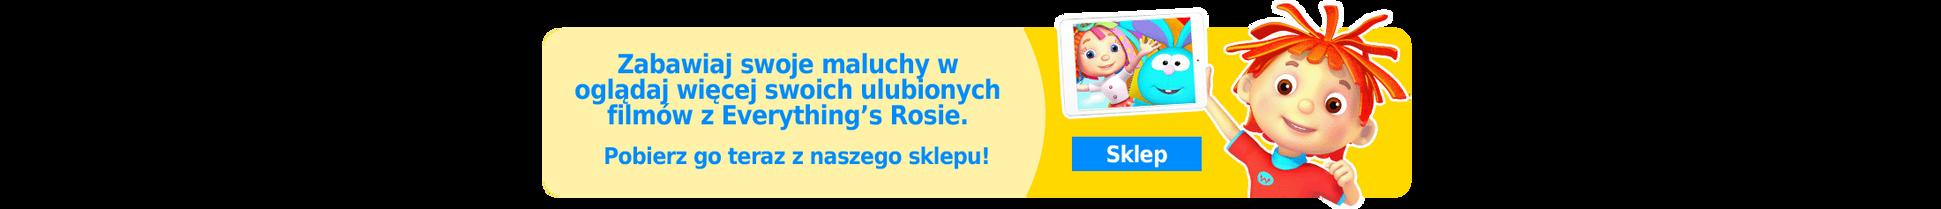 polish - video-pages---shop-banner---1.p